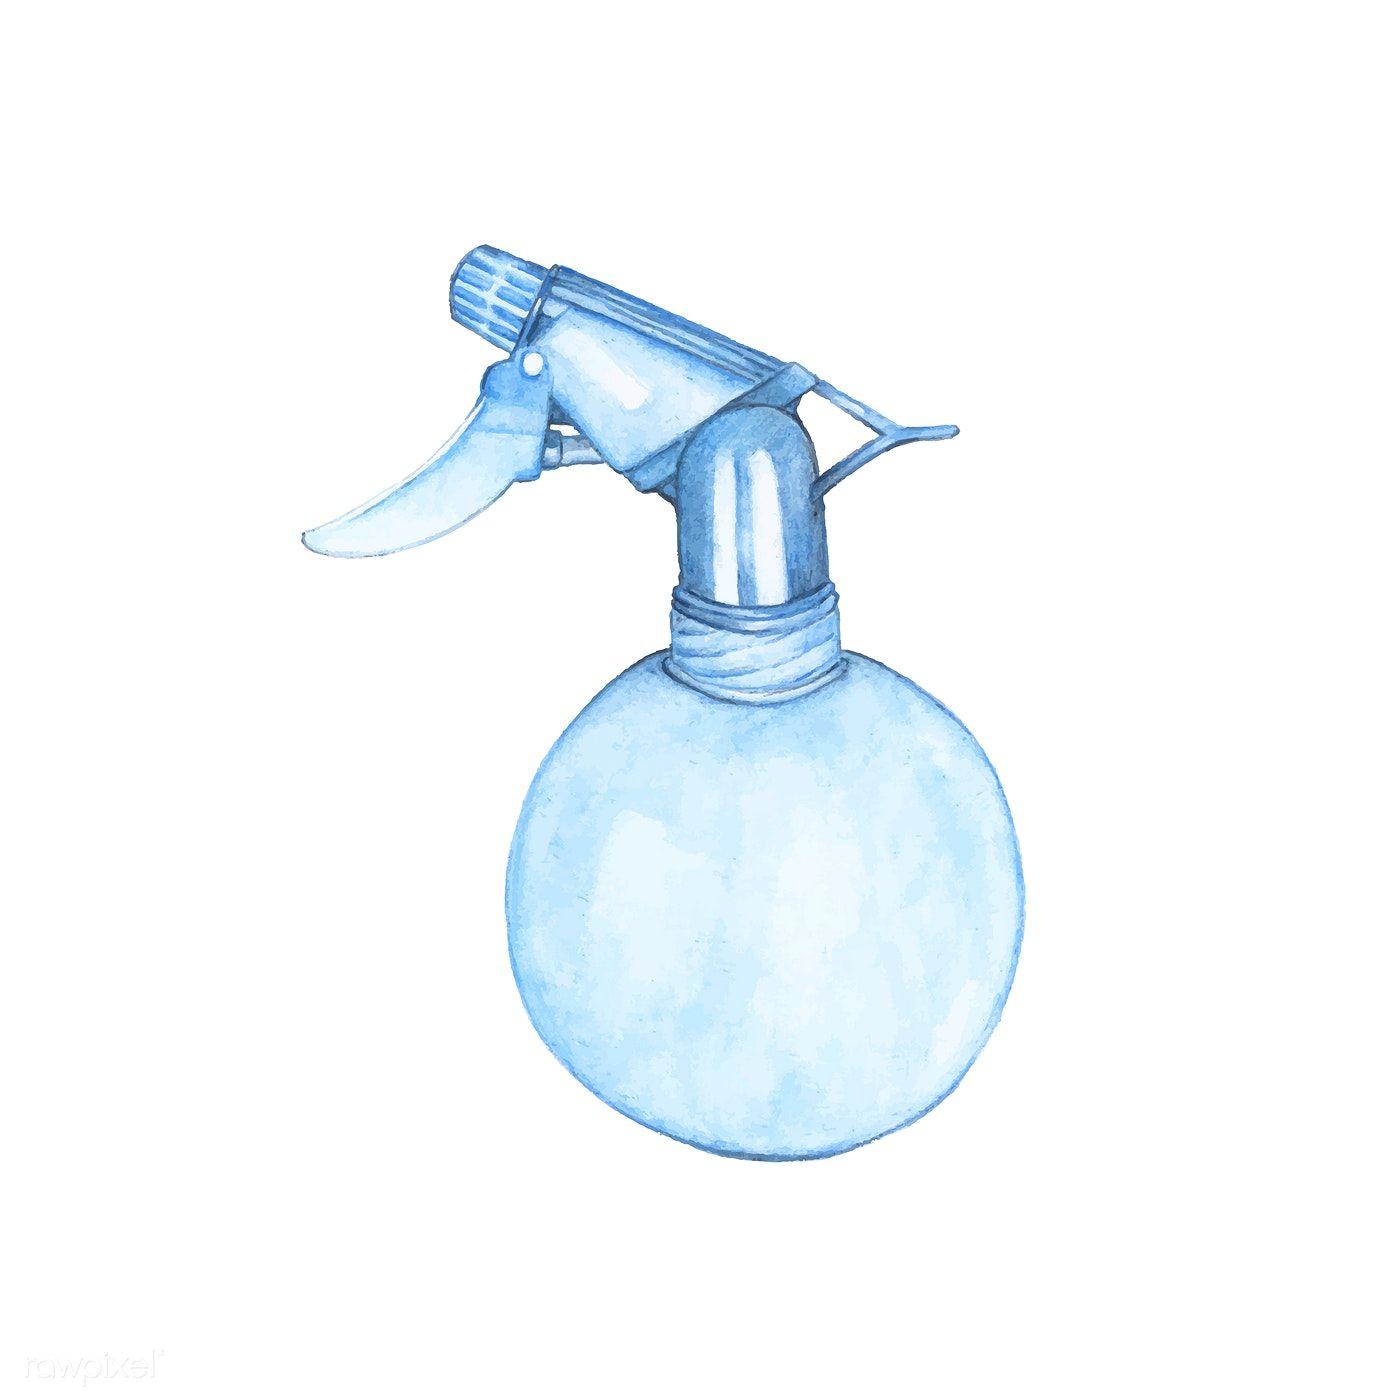 44+ Water spray bottle clipart information